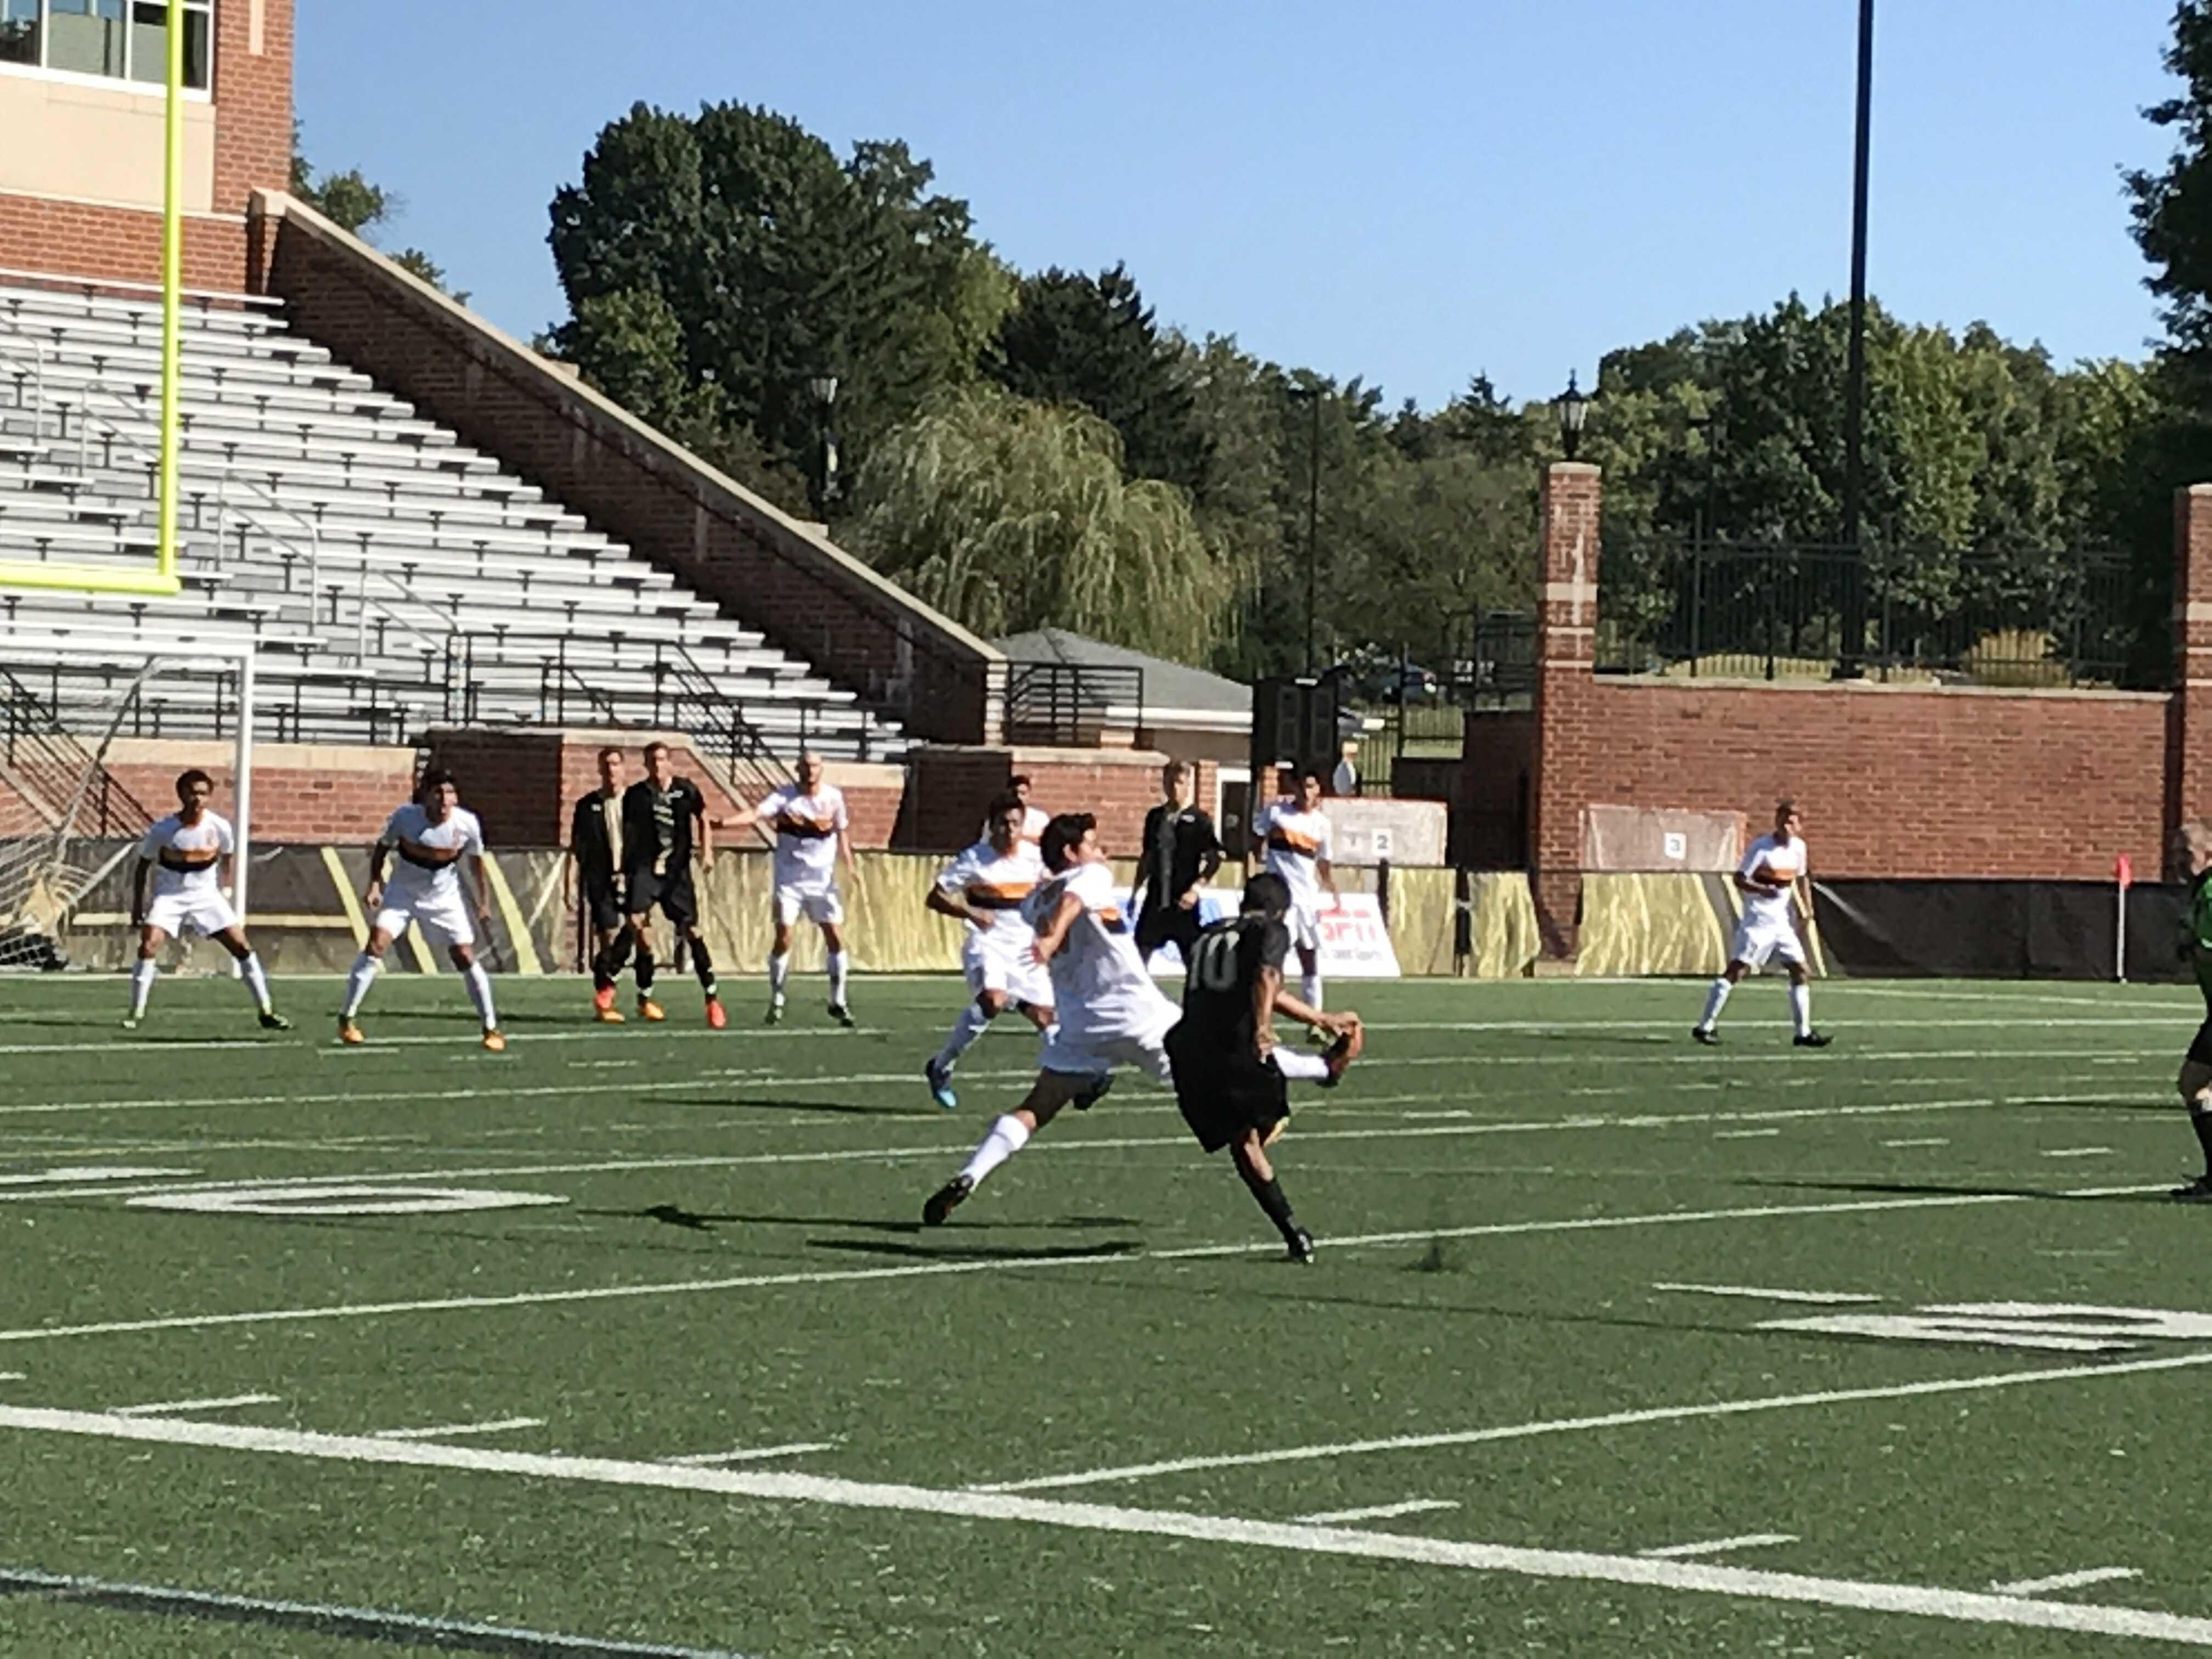 (10) Gabriel Jaimes attempts a shot on goal against Fort Hays State on Oct. 8 in Harlen C. Hunter Stadium.  Photo by Kyle Rhine